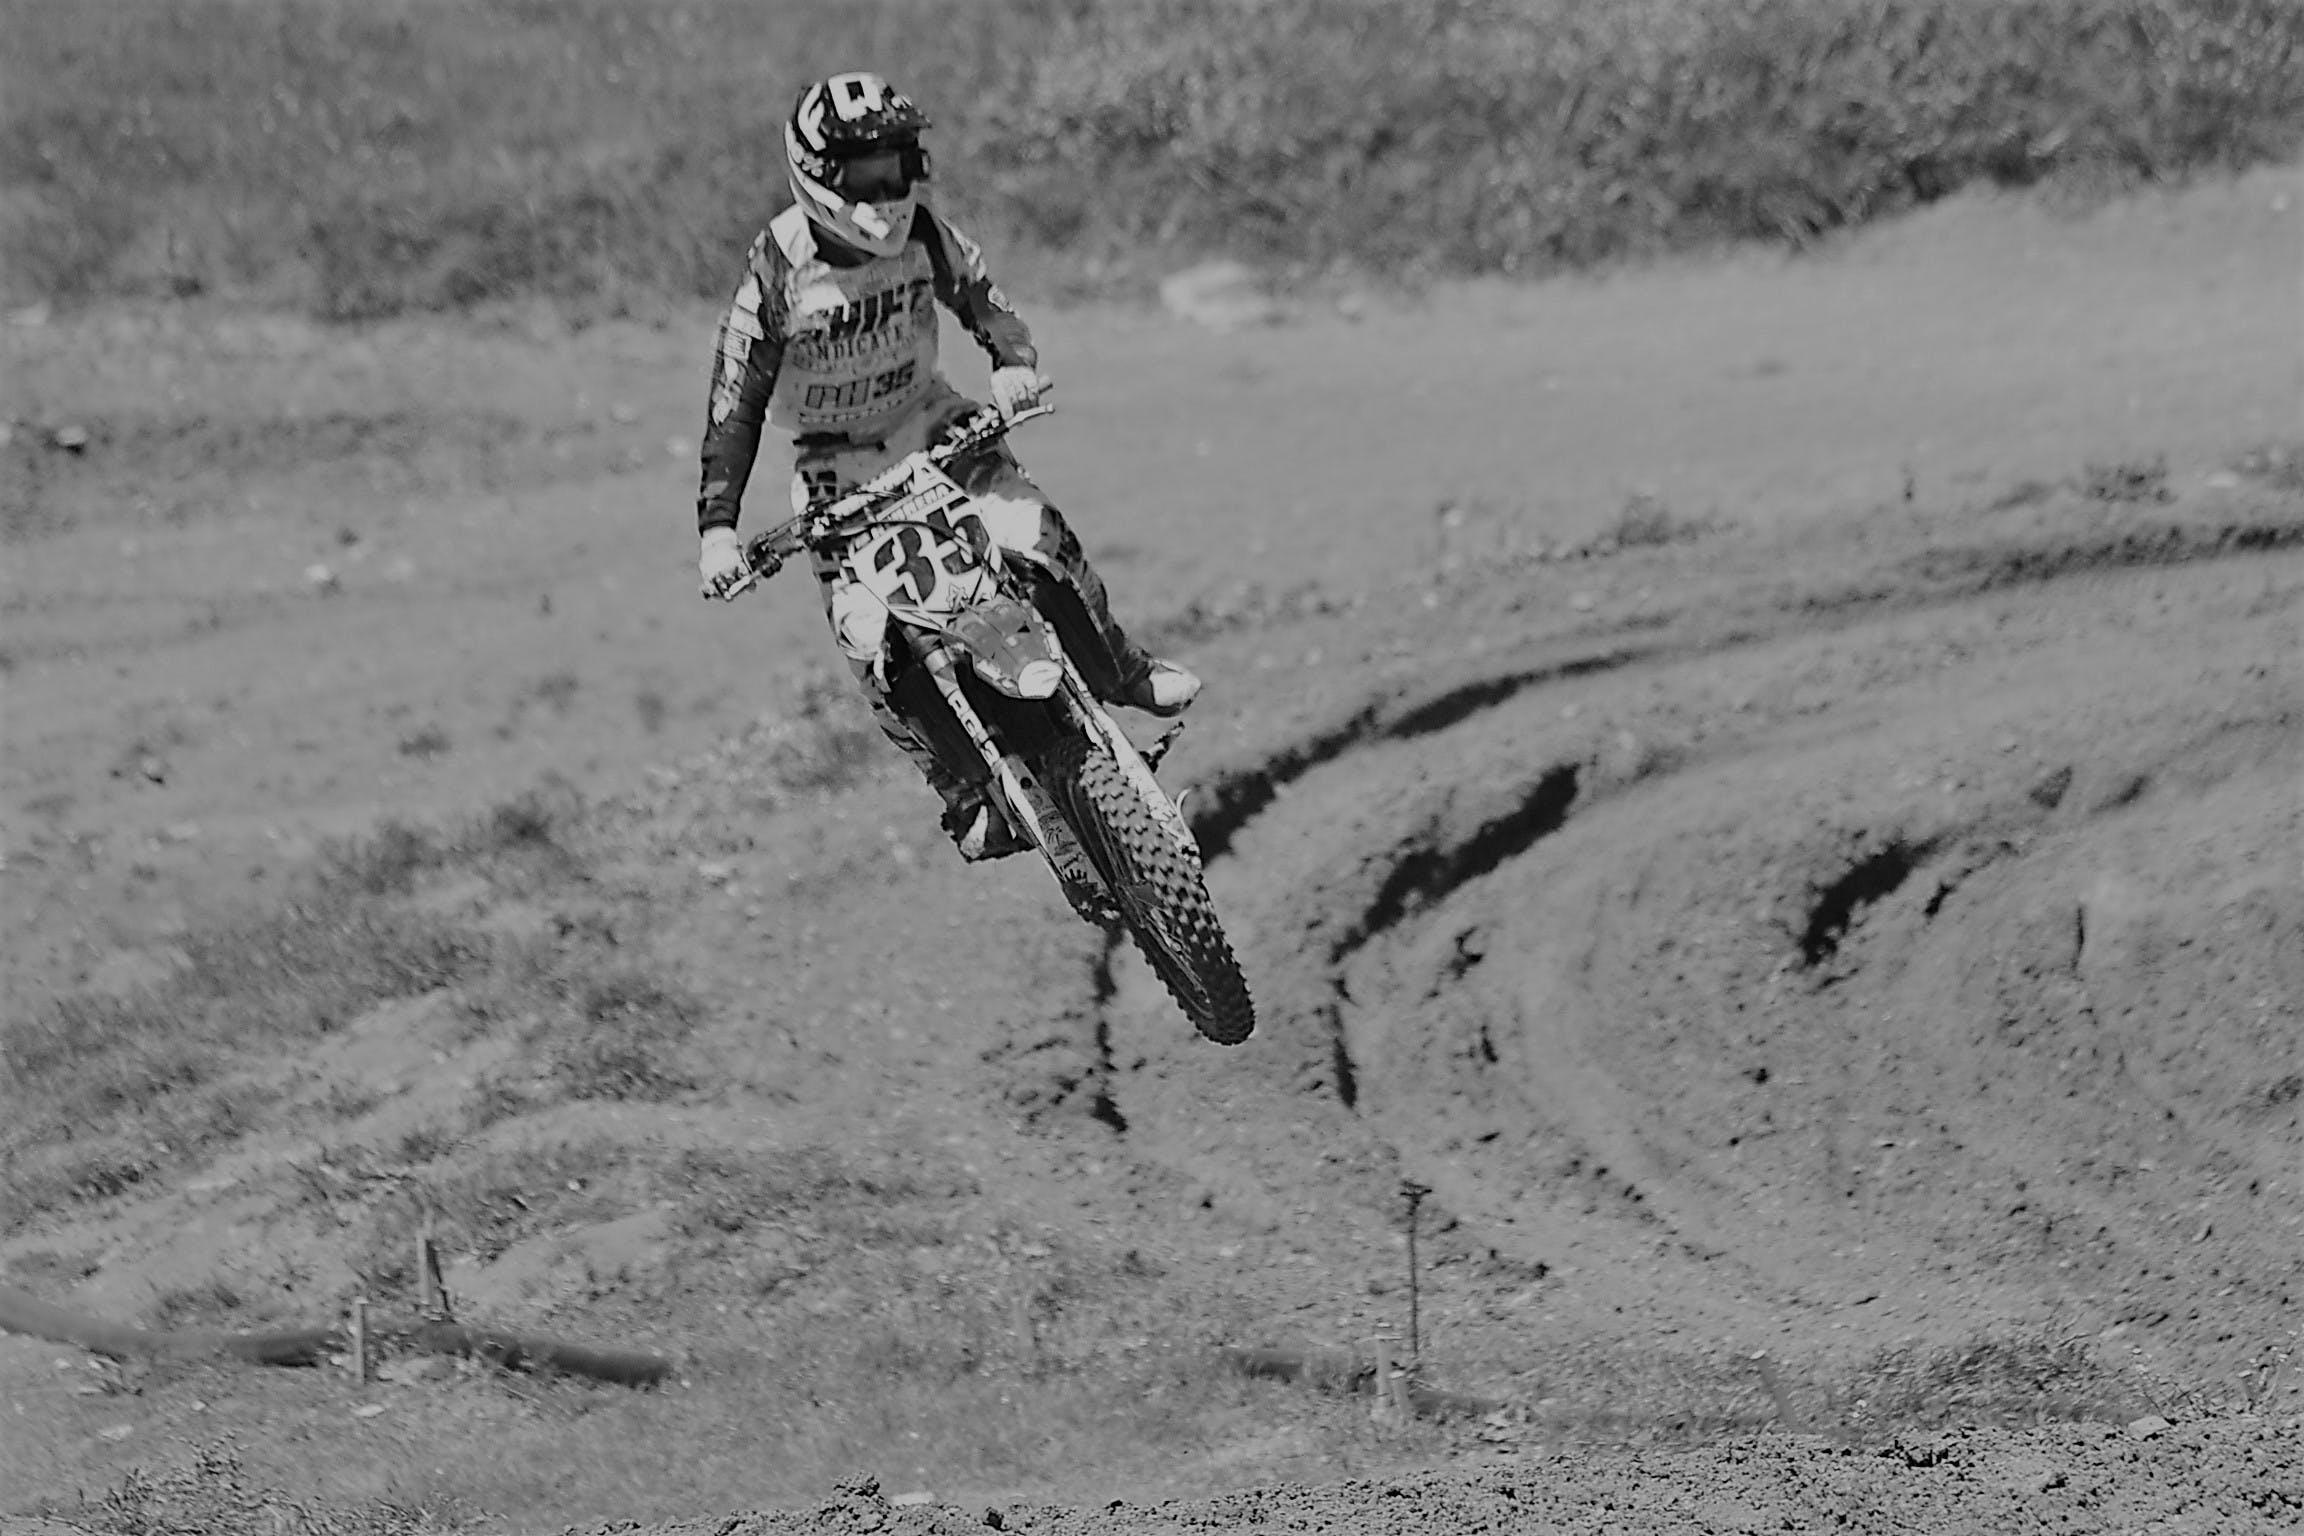 Free stock photo of biker, black and white, jump, motocross